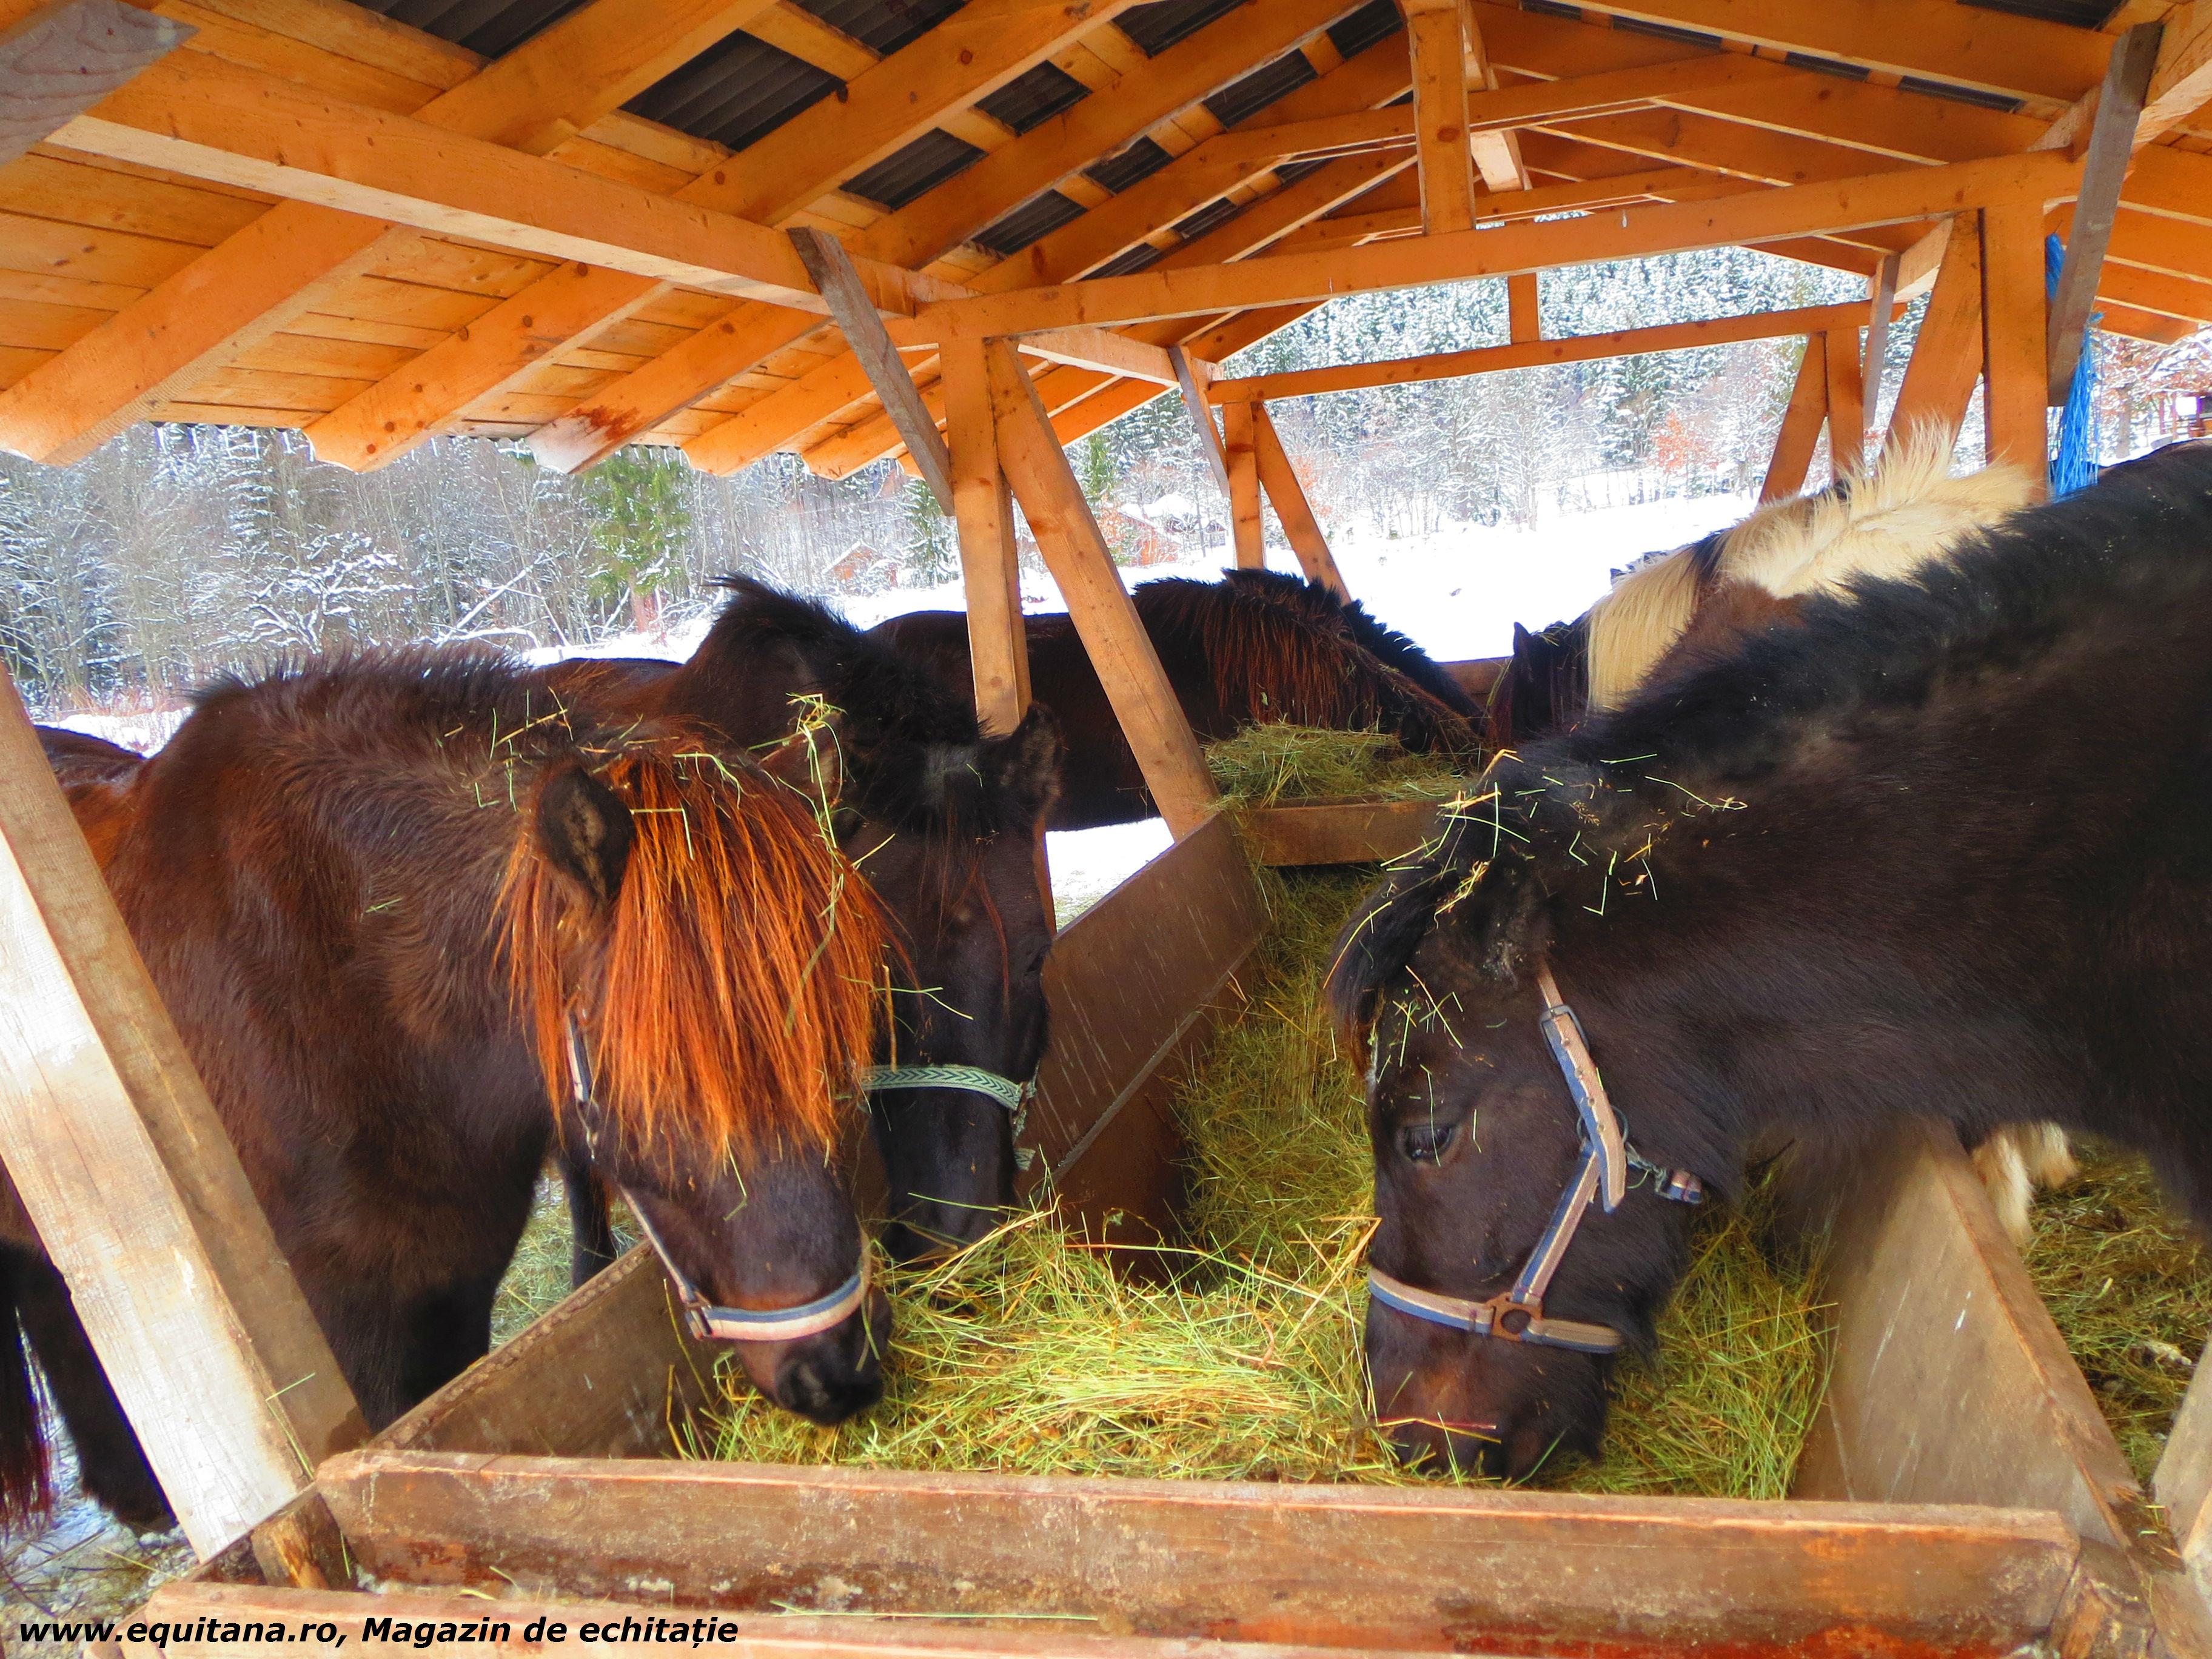 Echitaţie cu cai islandezi, Ivo Riding Ranch, jud. Harghita